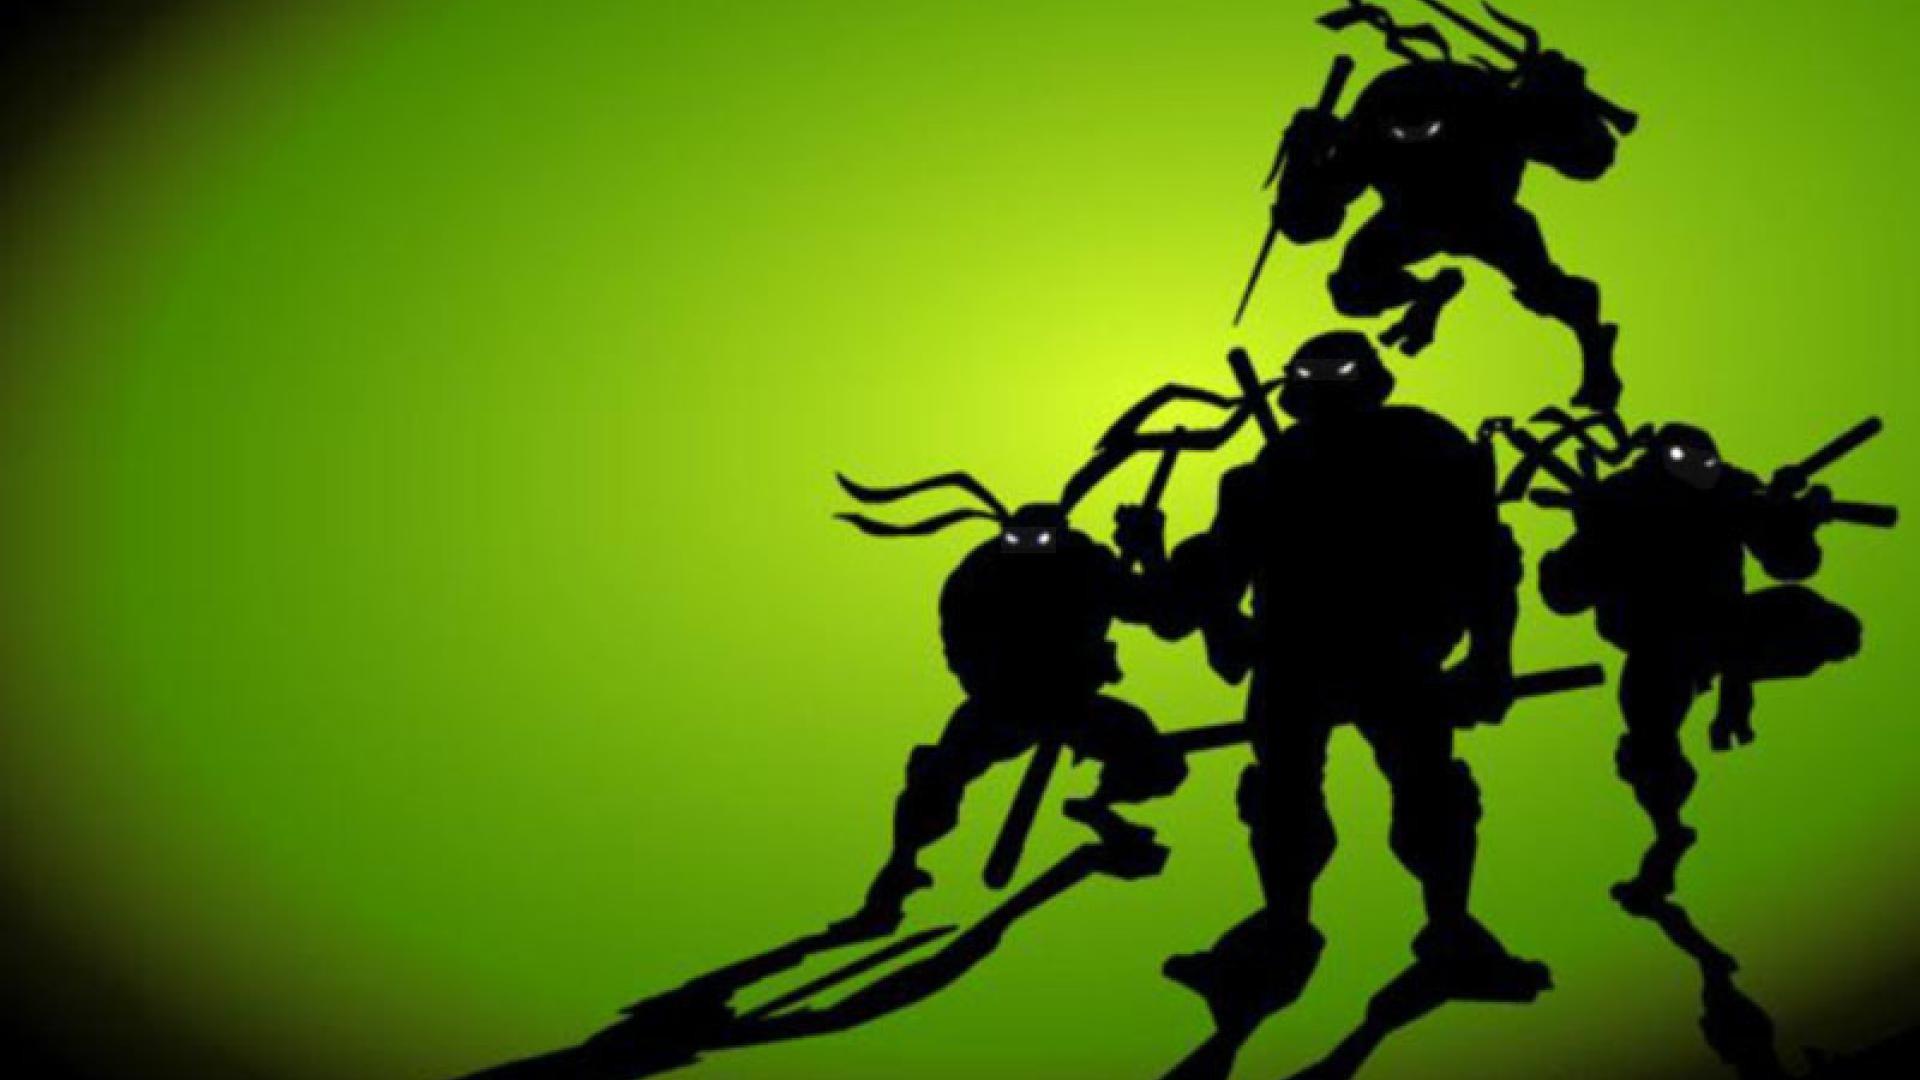 33 Teenage Mutant Ninja Turtles HD Wallpapers   Backgrounds …   Download  Wallpaper   Pinterest   Wallpaper backgrounds, Wallpaper and Hd wallpaper